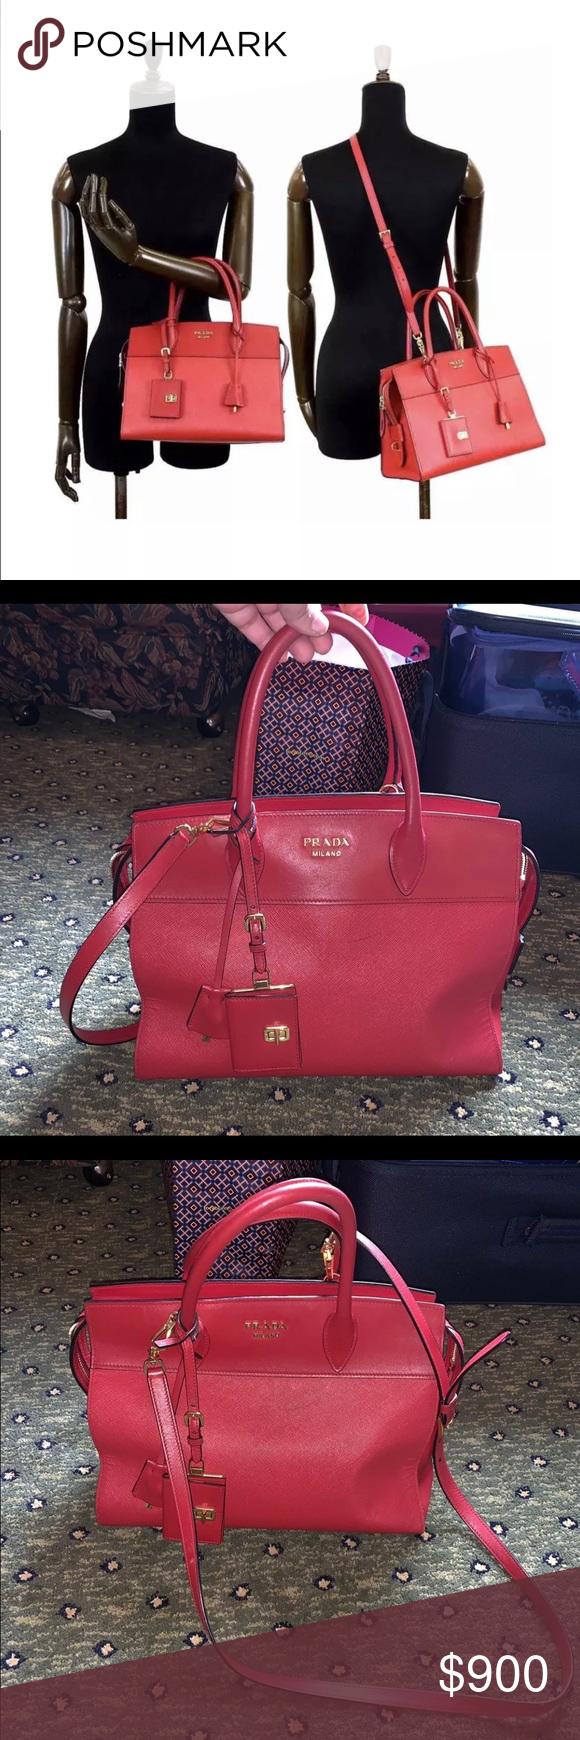 1512e0c3f82e PRADA Saffiano Soft Calfskin Bandoliera Bag Fuoco Bought a couple of years  ago. Wears on